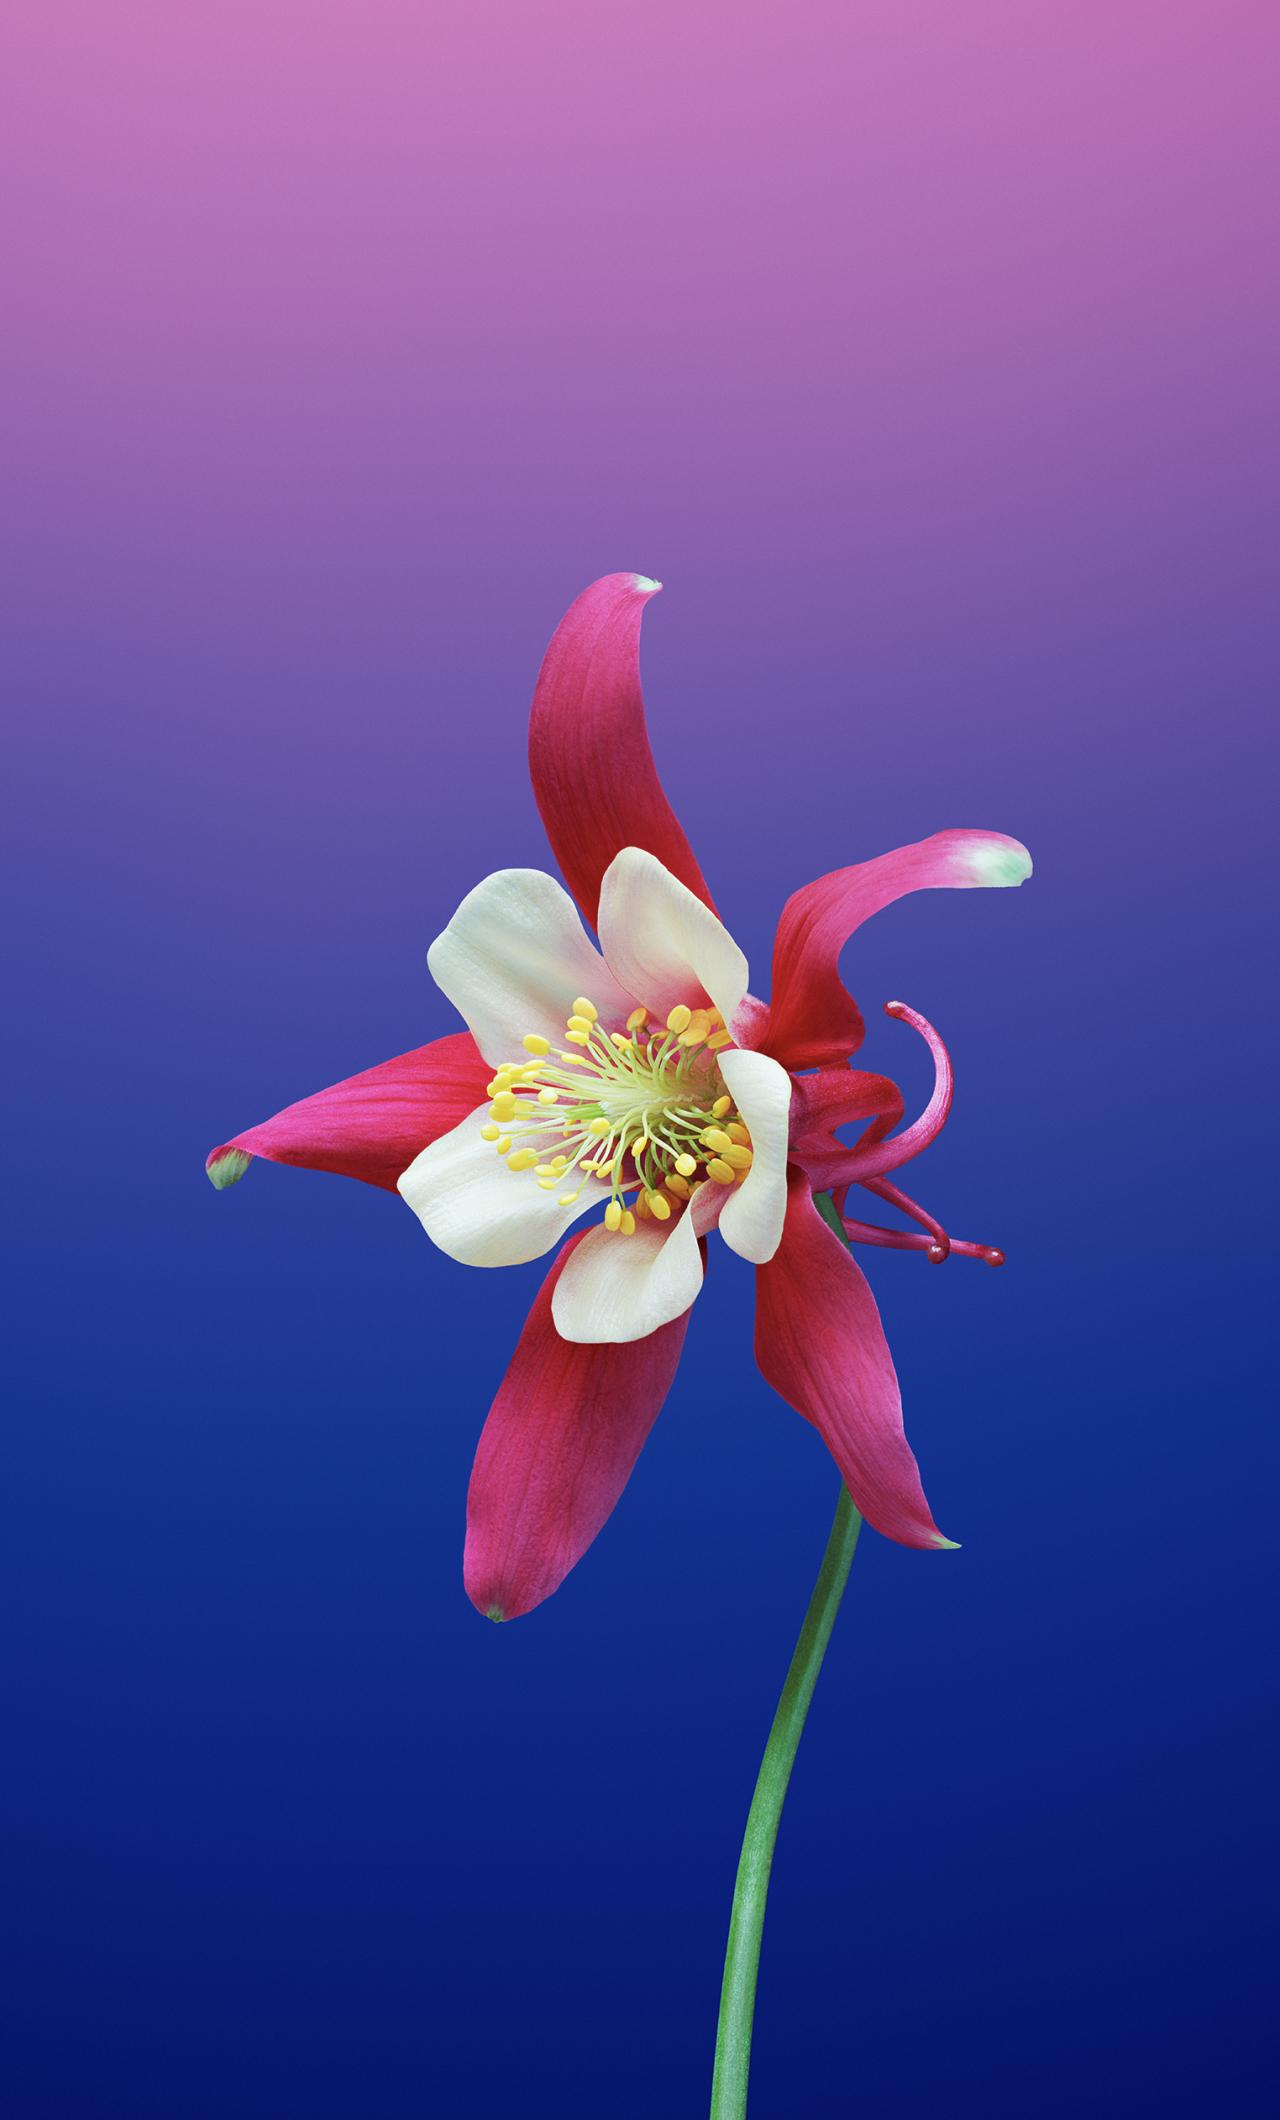 Ios 11 Flower Aquilegia, Full HD 2K Wallpaper